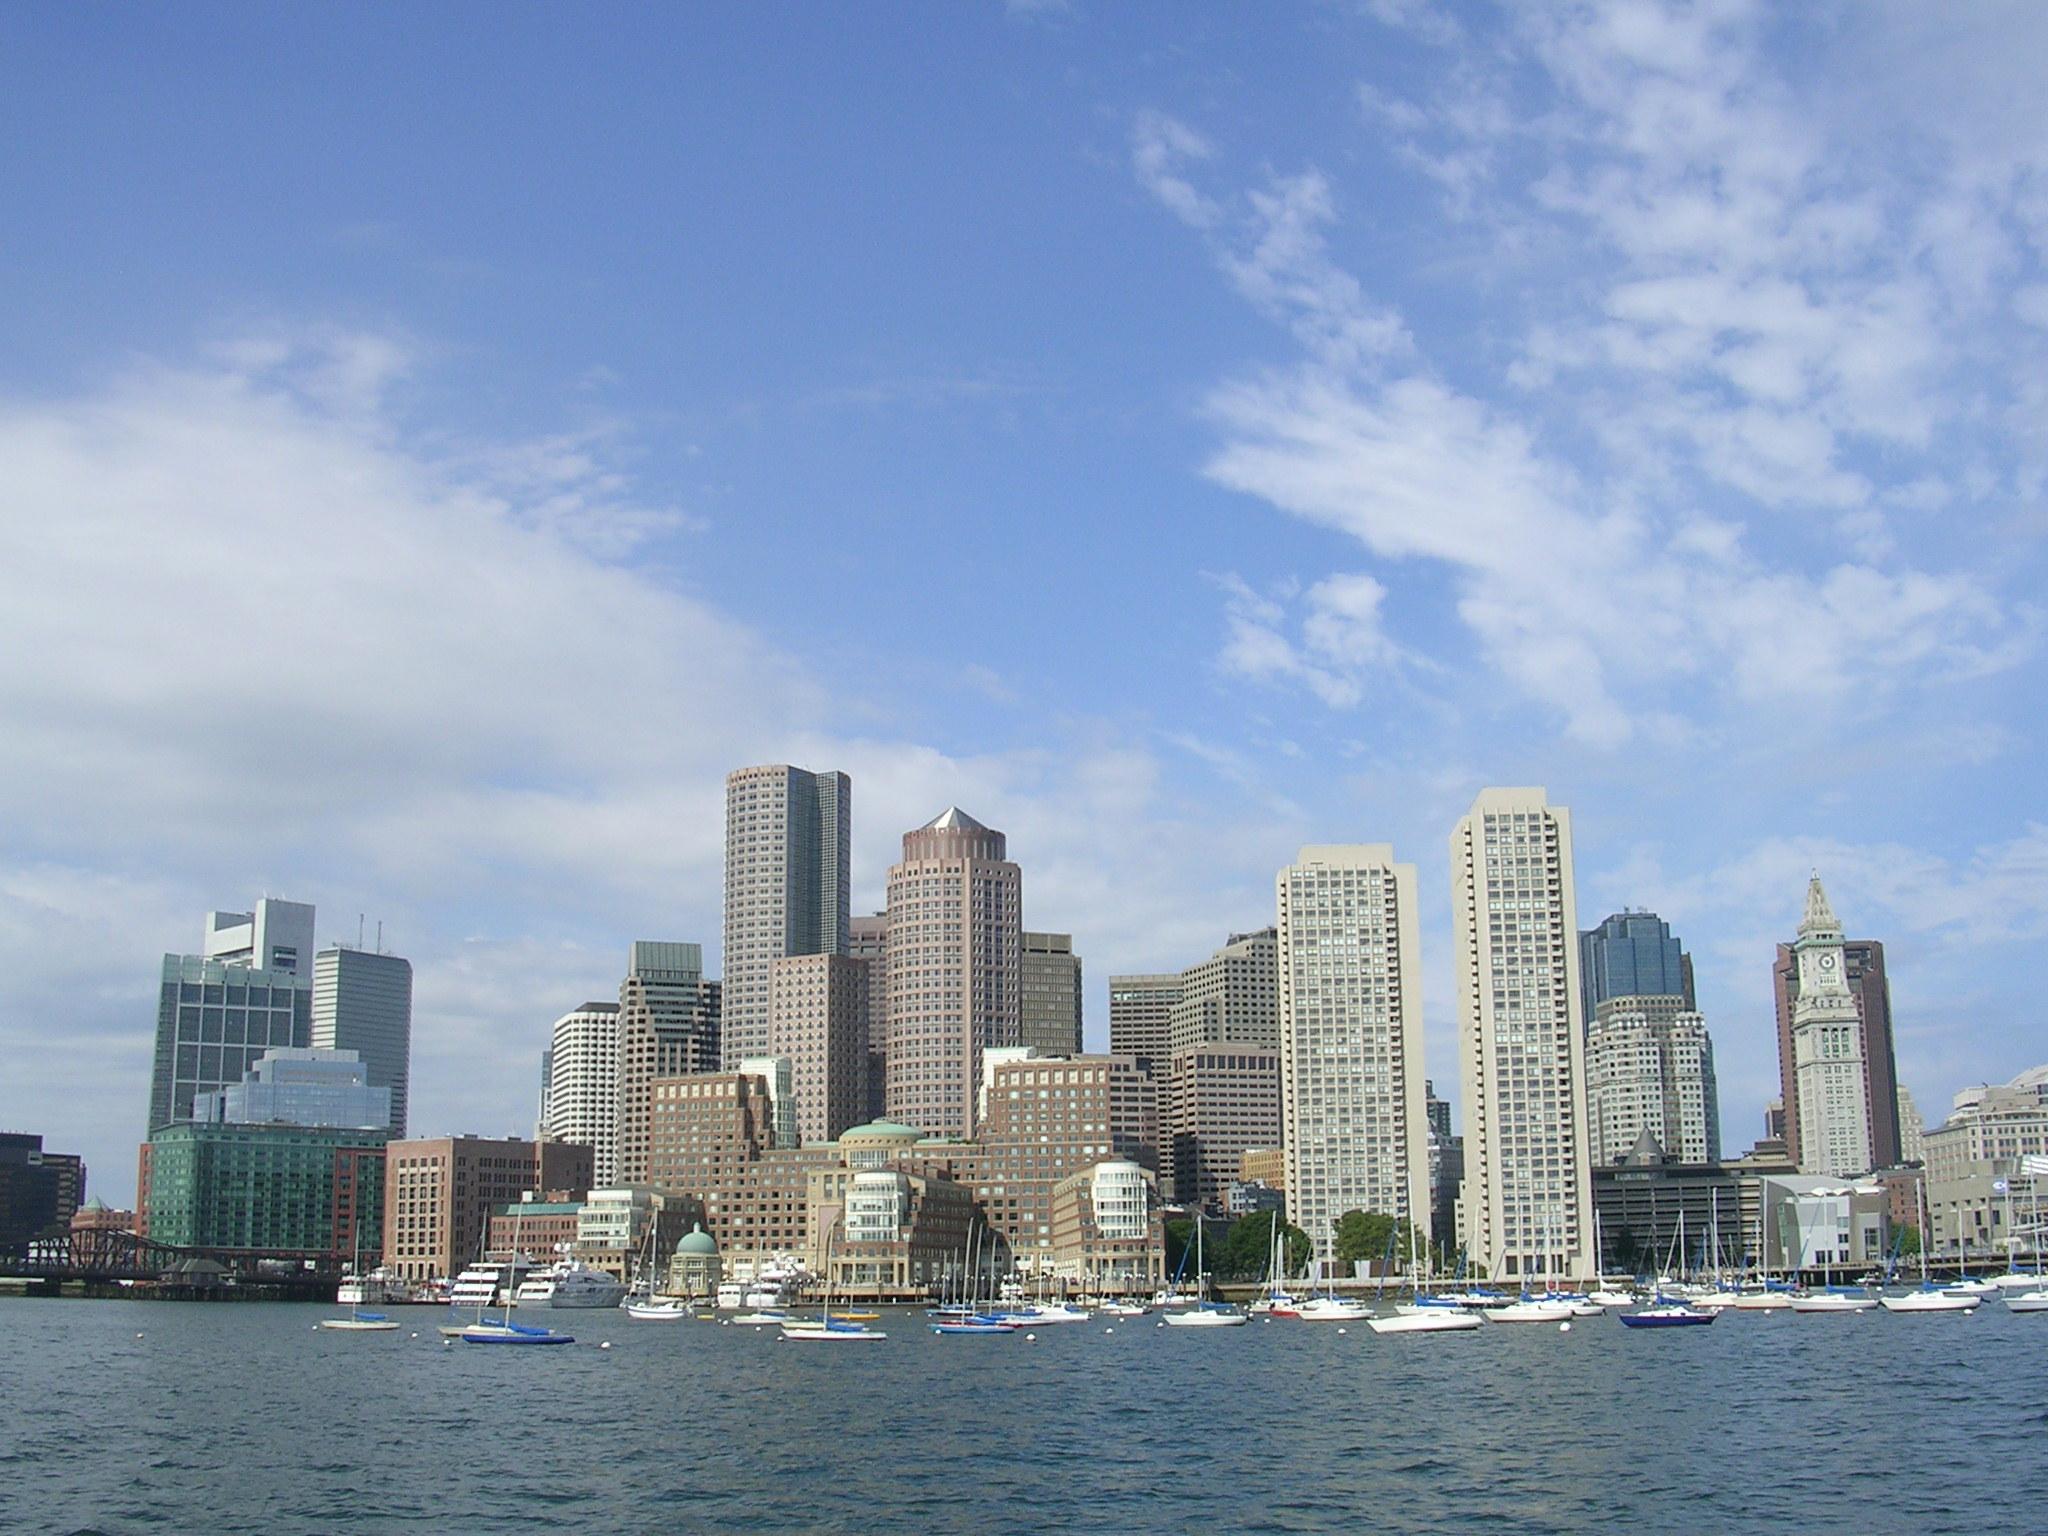 boston http-::www.sxc.hu:photo:1315324.jpg